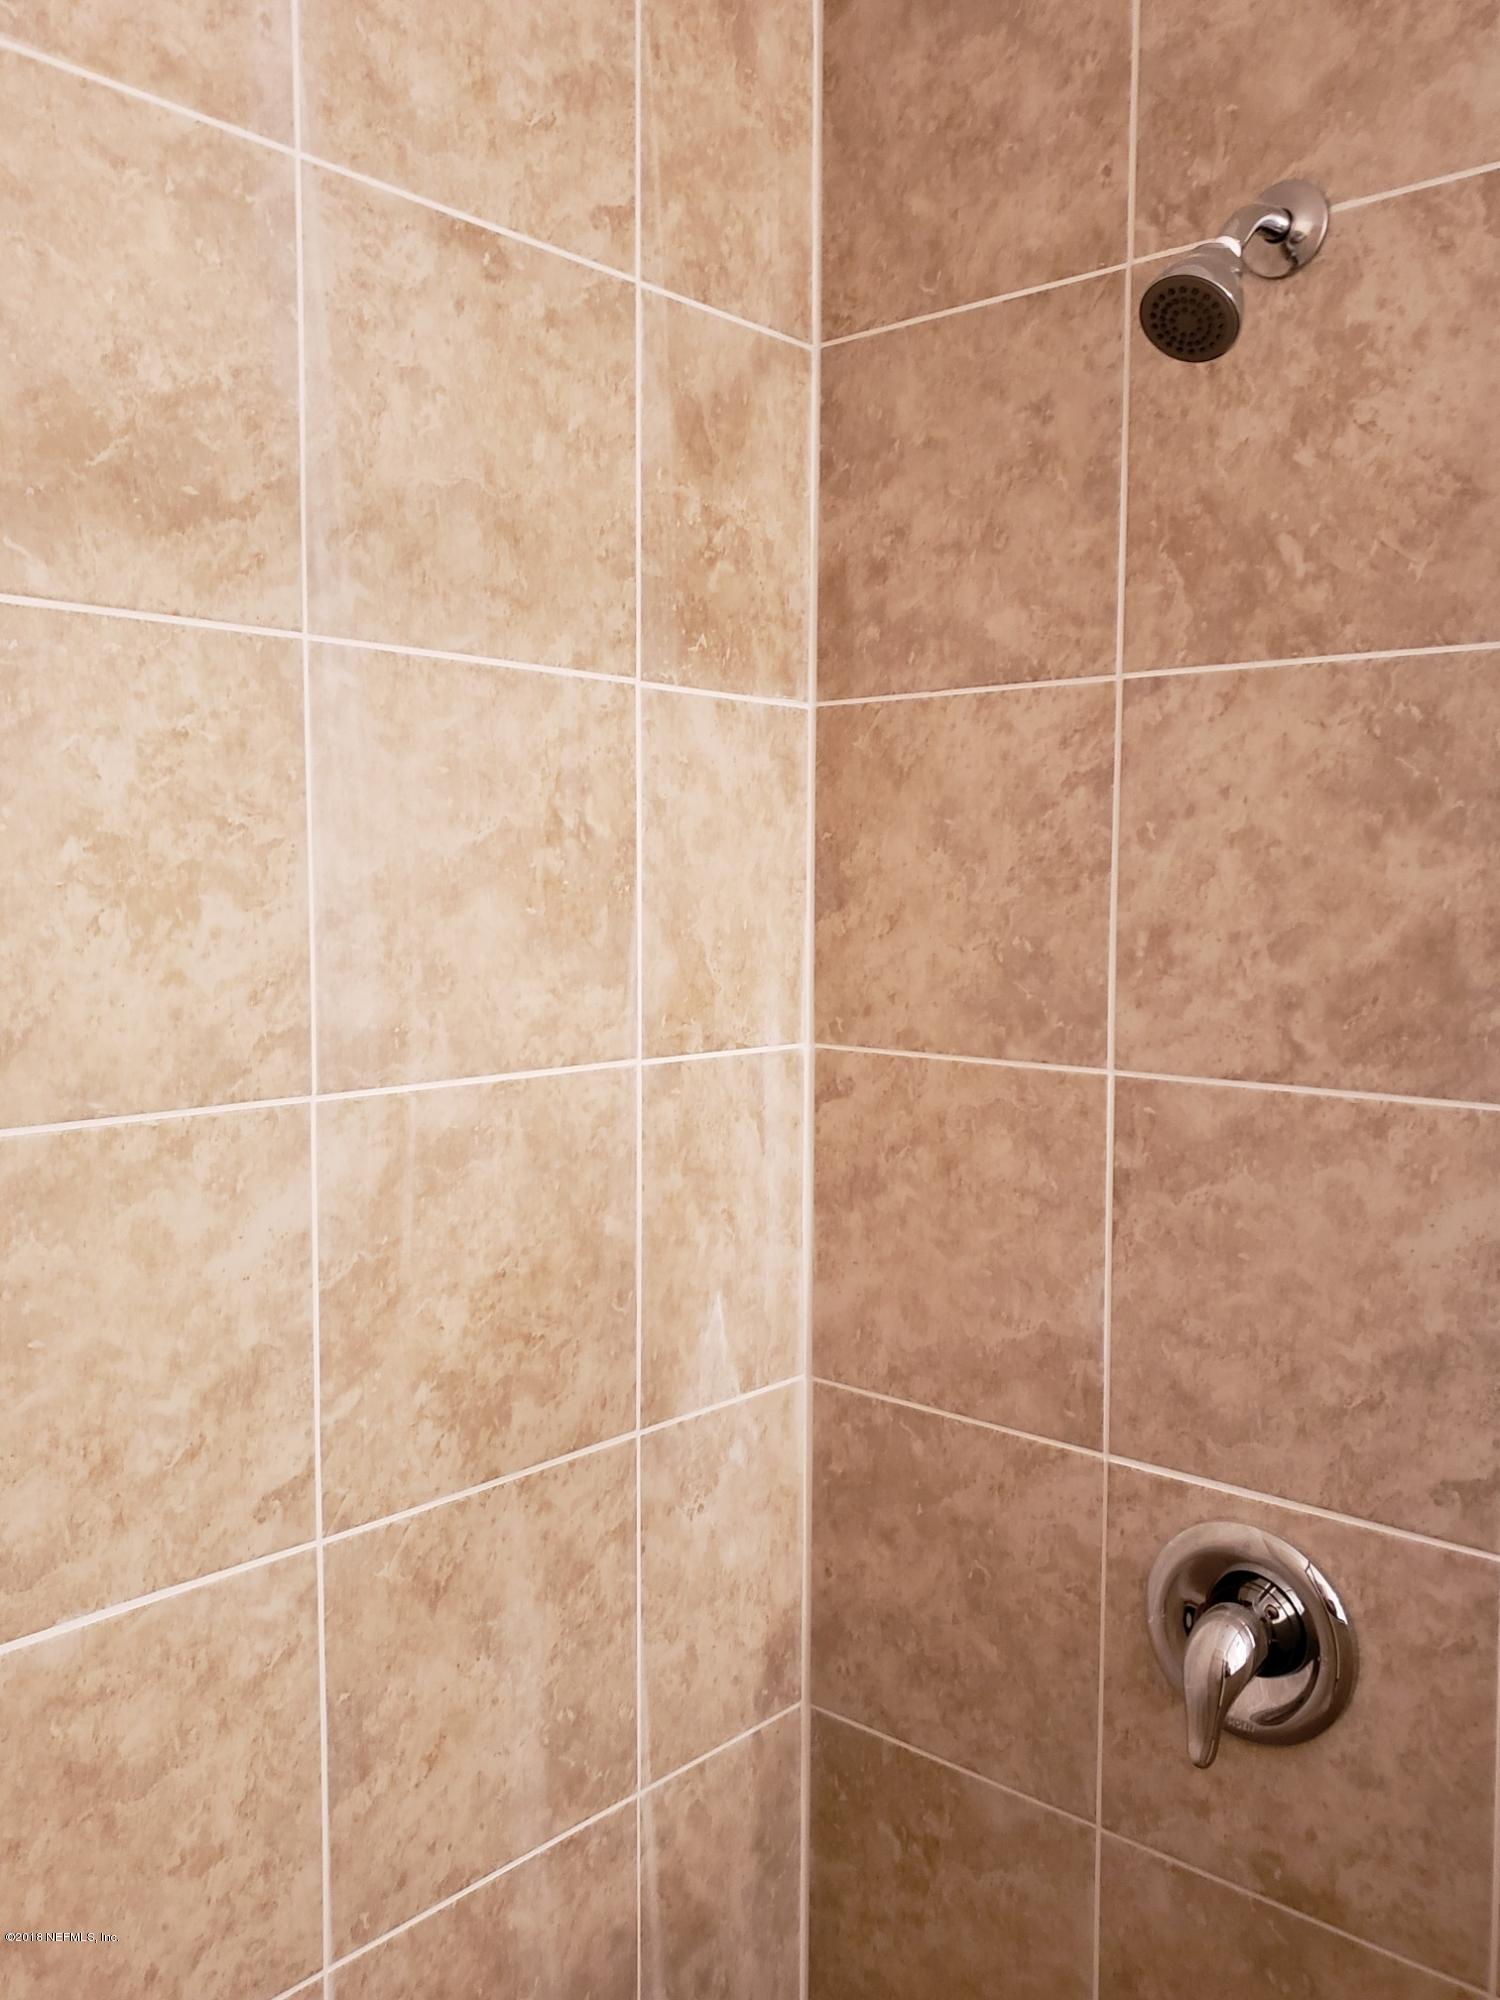 1143 FLORIDA, FLEMING ISLAND, FLORIDA 32003, 4 Bedrooms Bedrooms, ,2 BathroomsBathrooms,Residential - single family,For sale,FLORIDA,925707